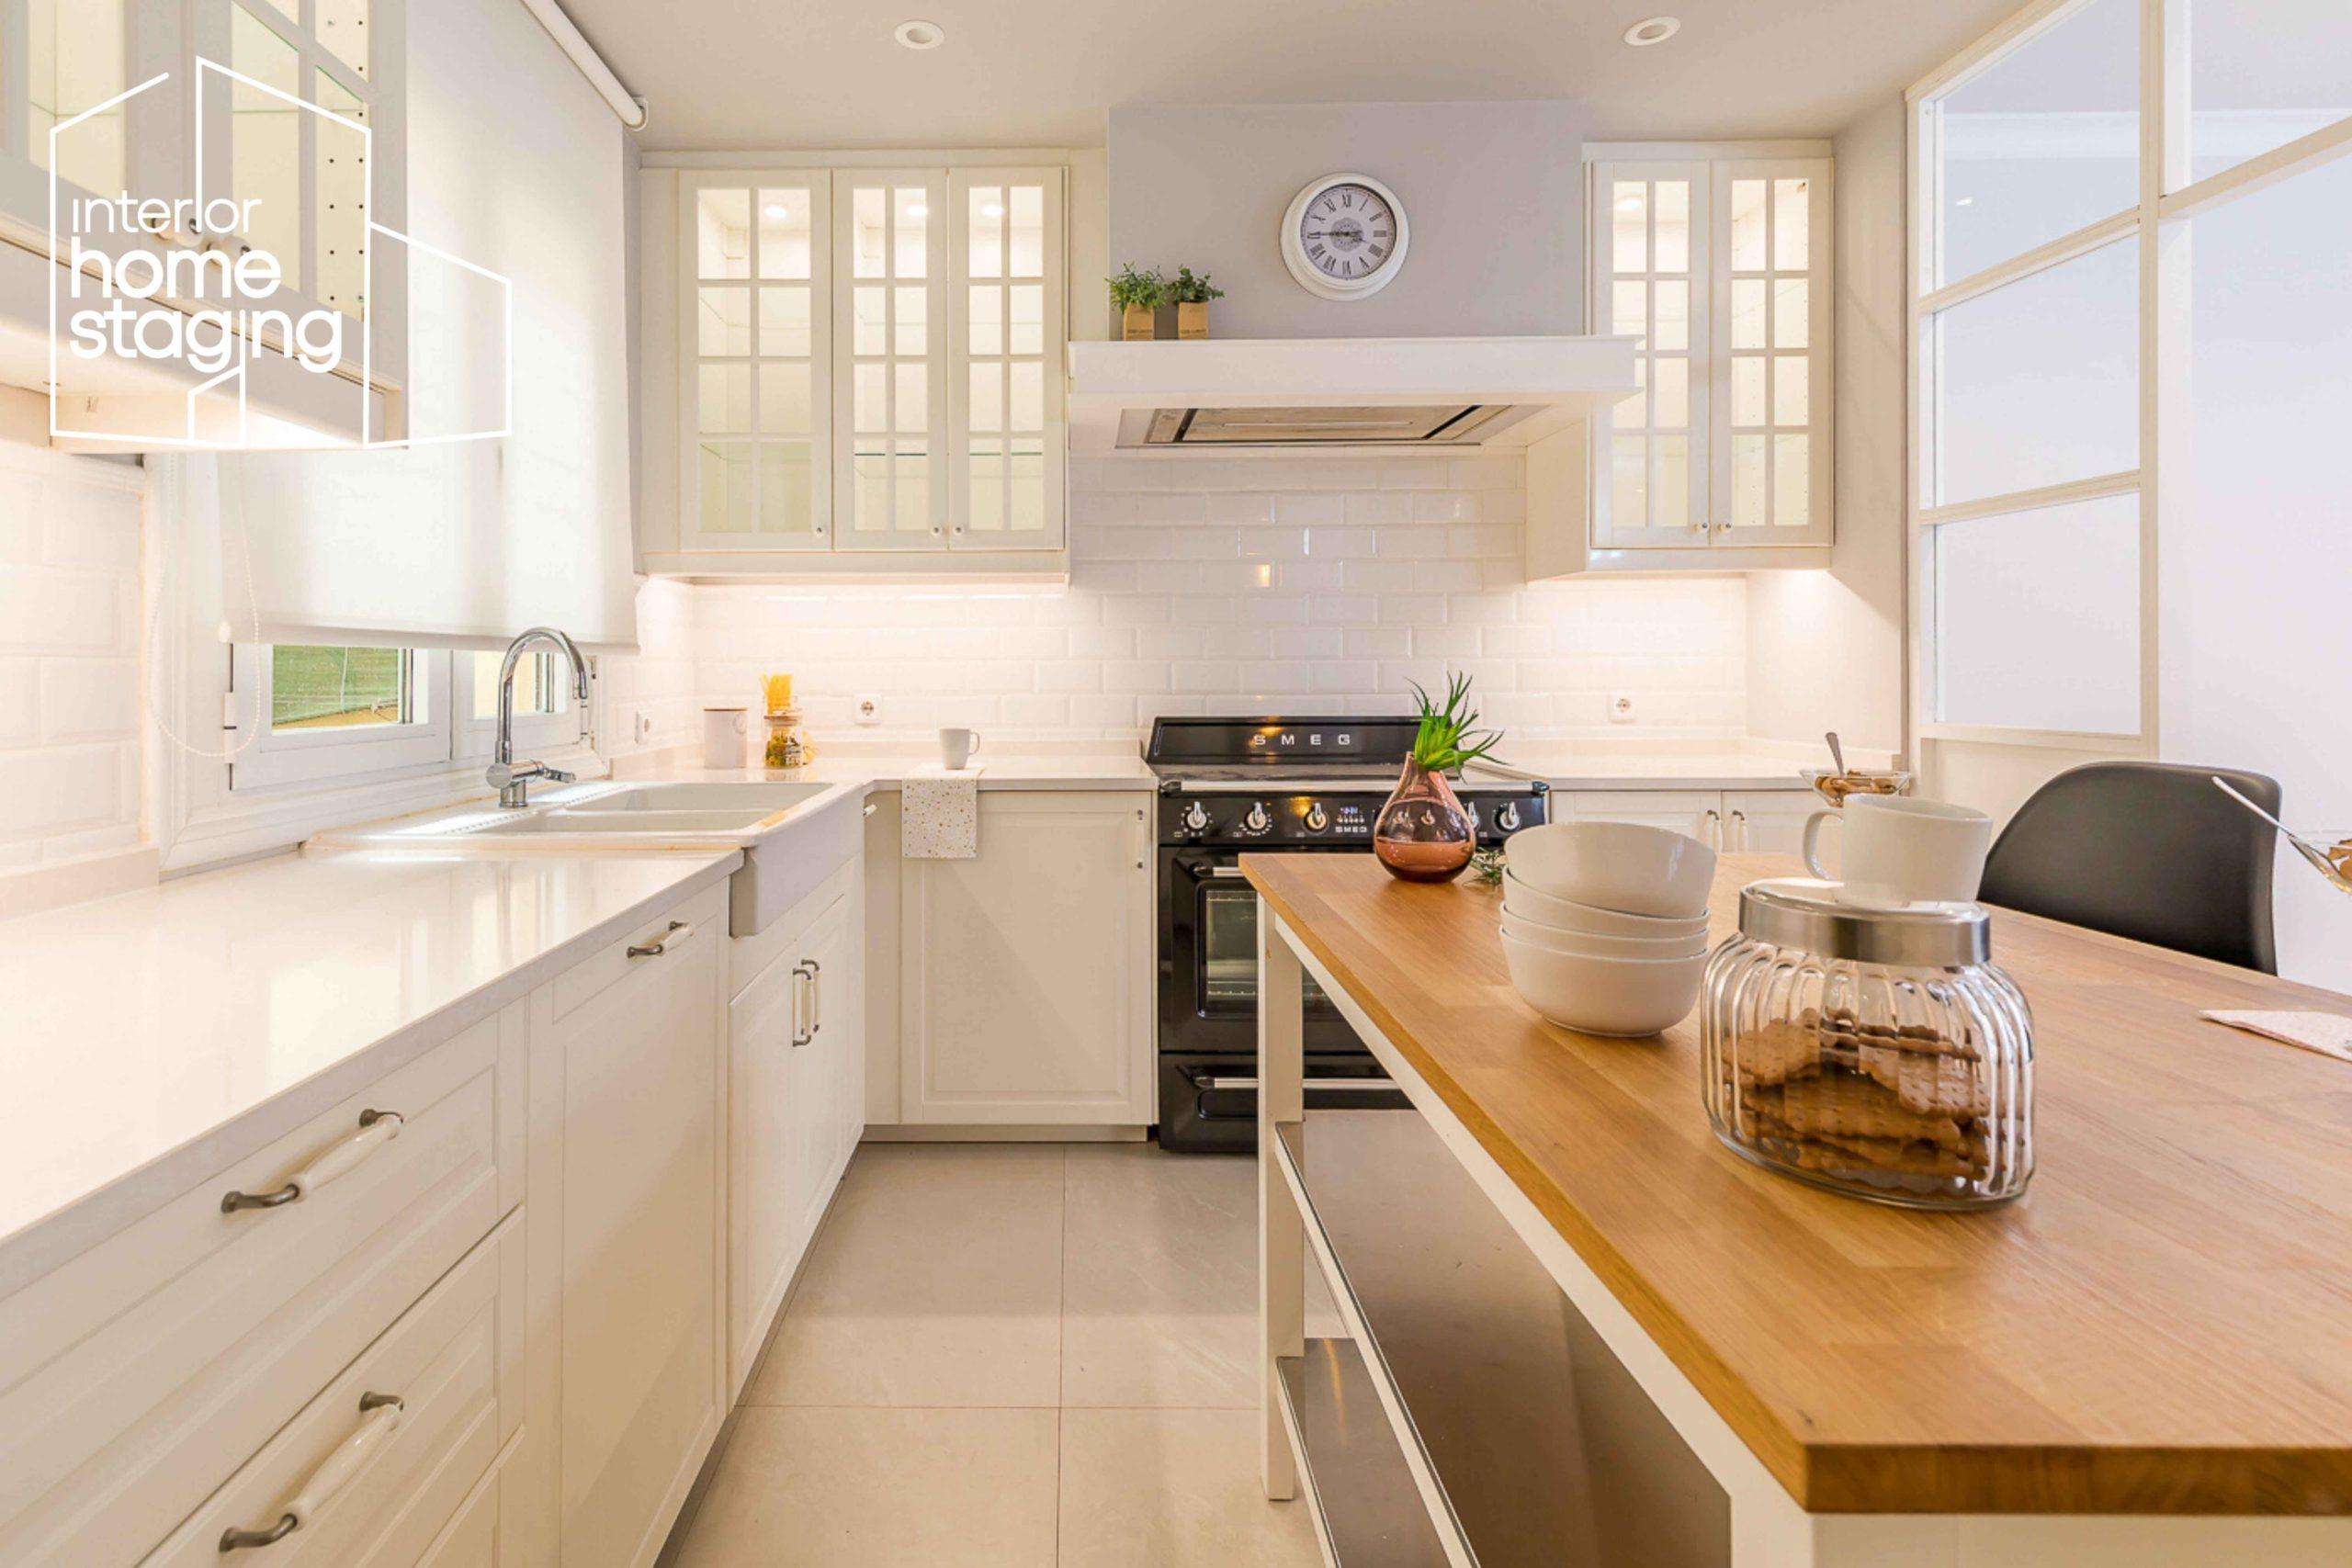 Decorar cocina para vender Barrio Salamanca